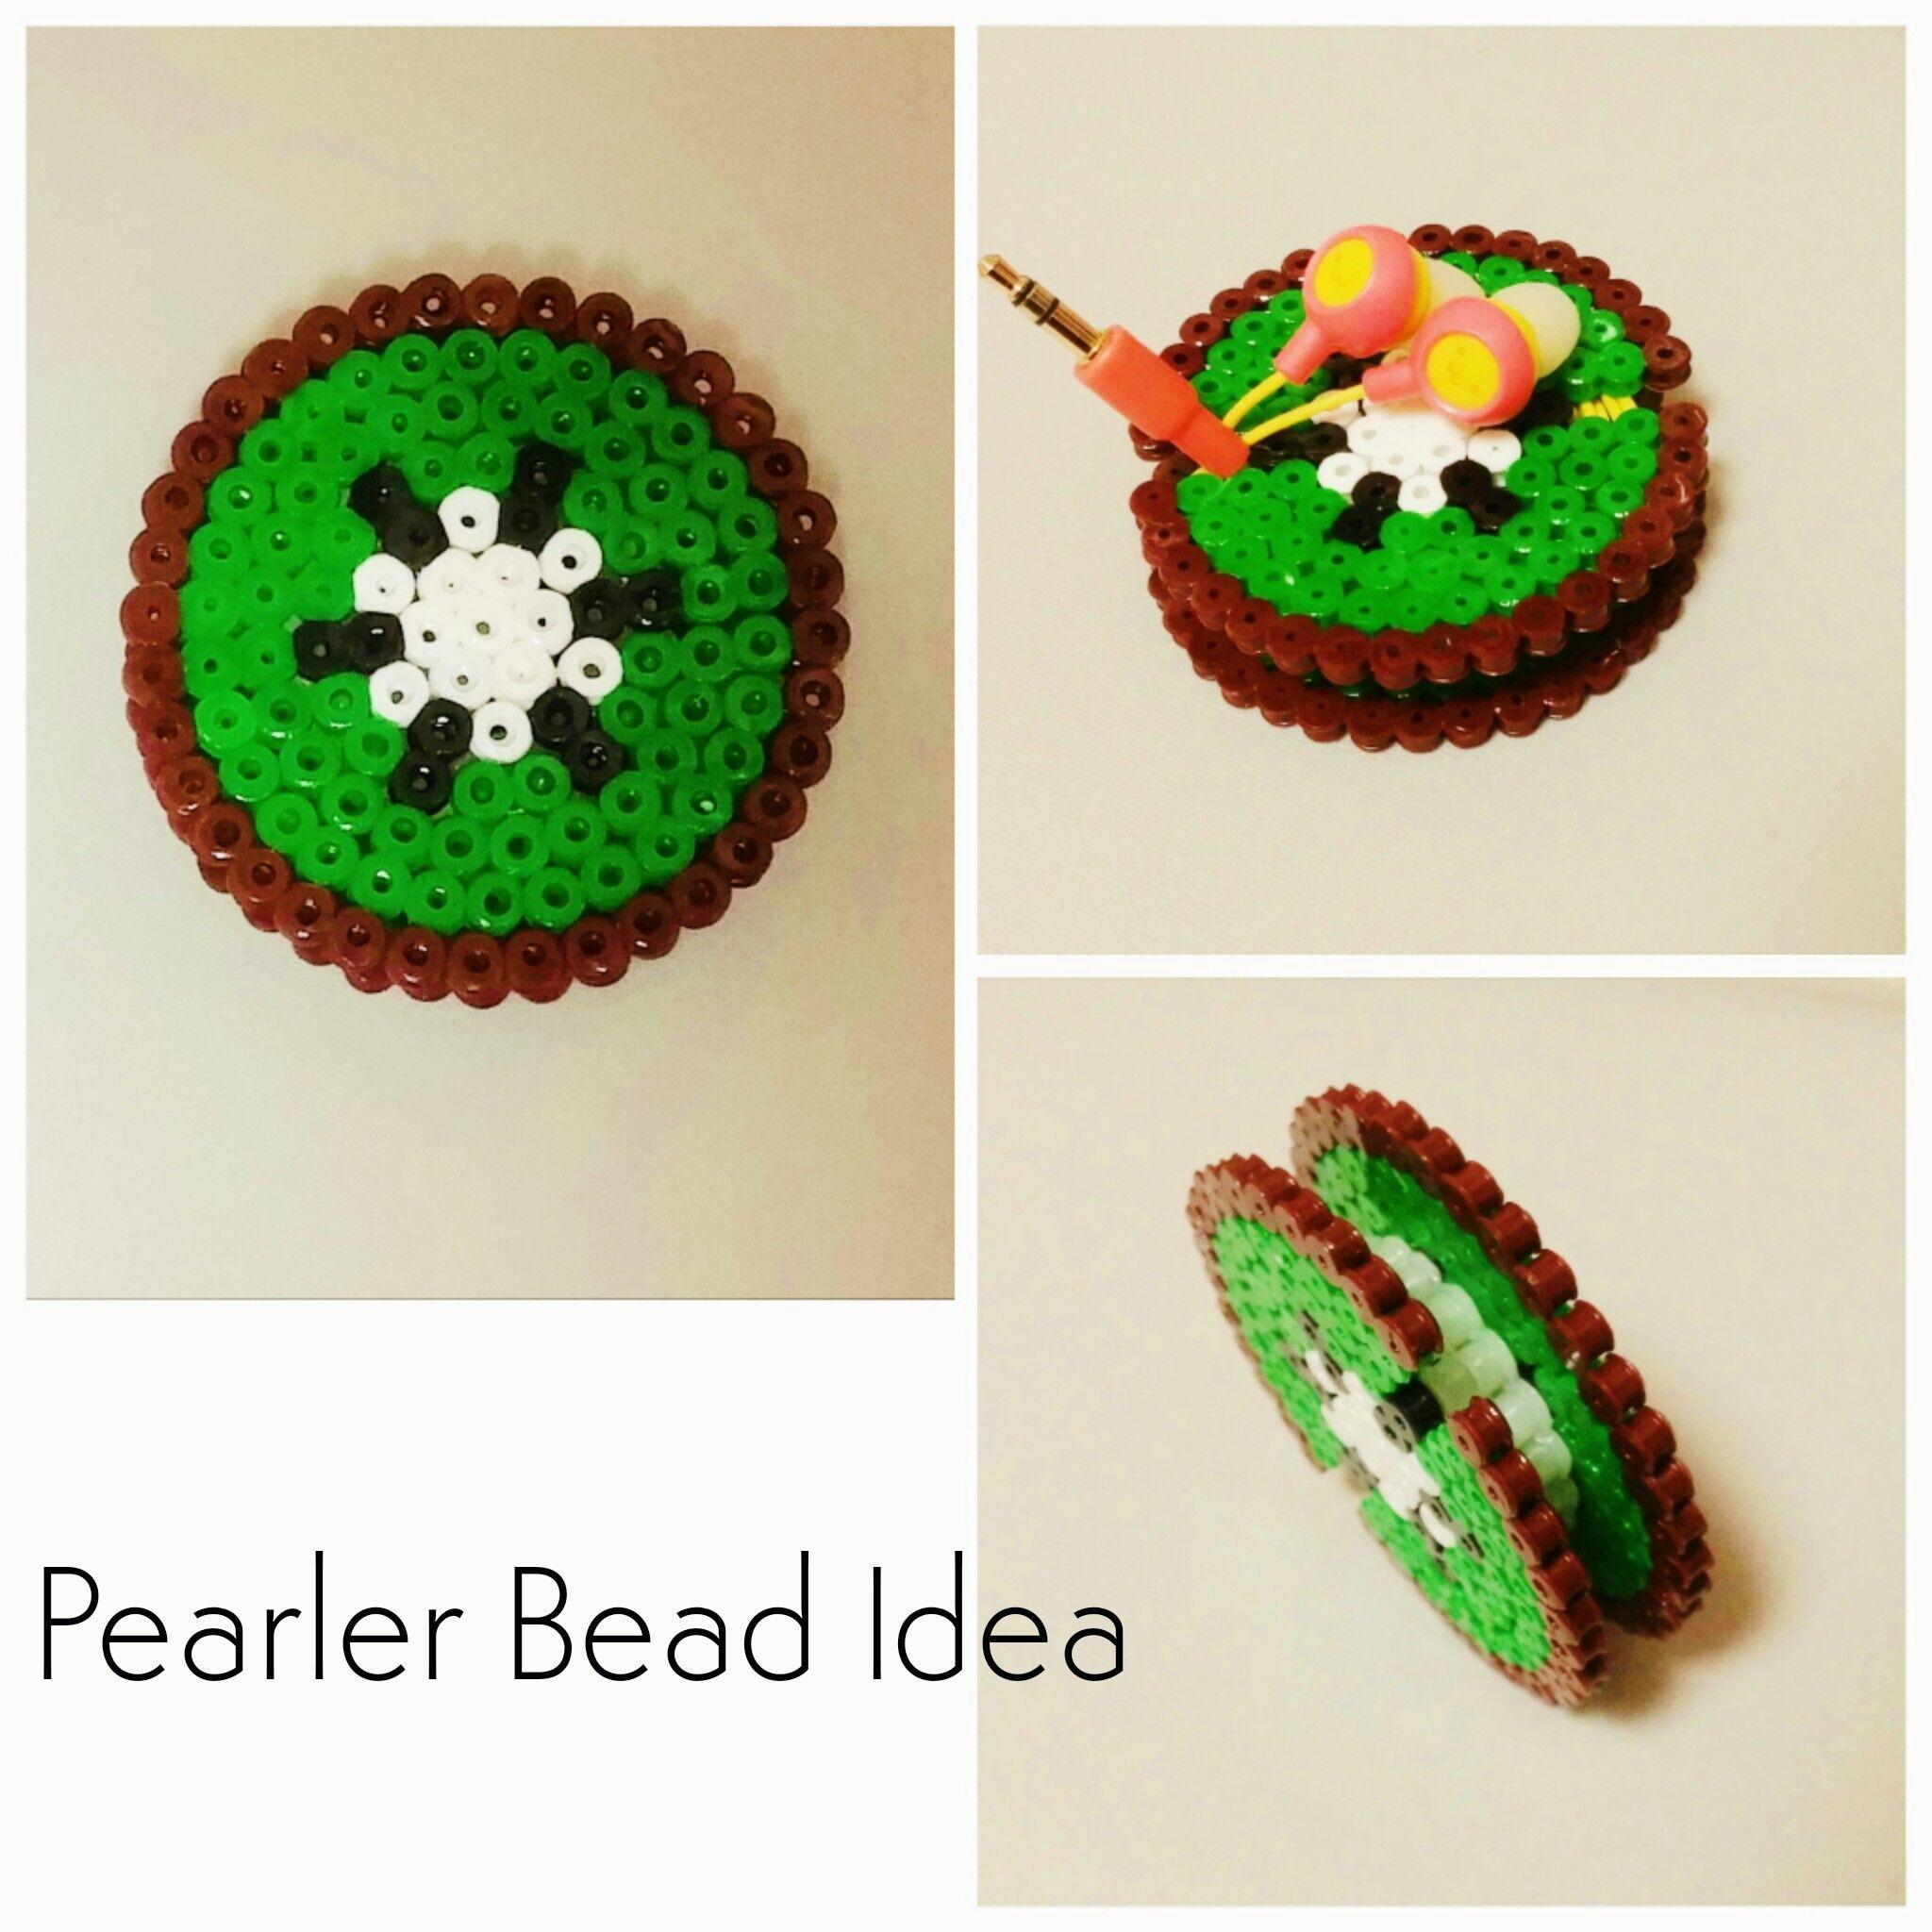 Pearler Bead Idea A Kiwi Earbud Holder Made Of Pearler Beads